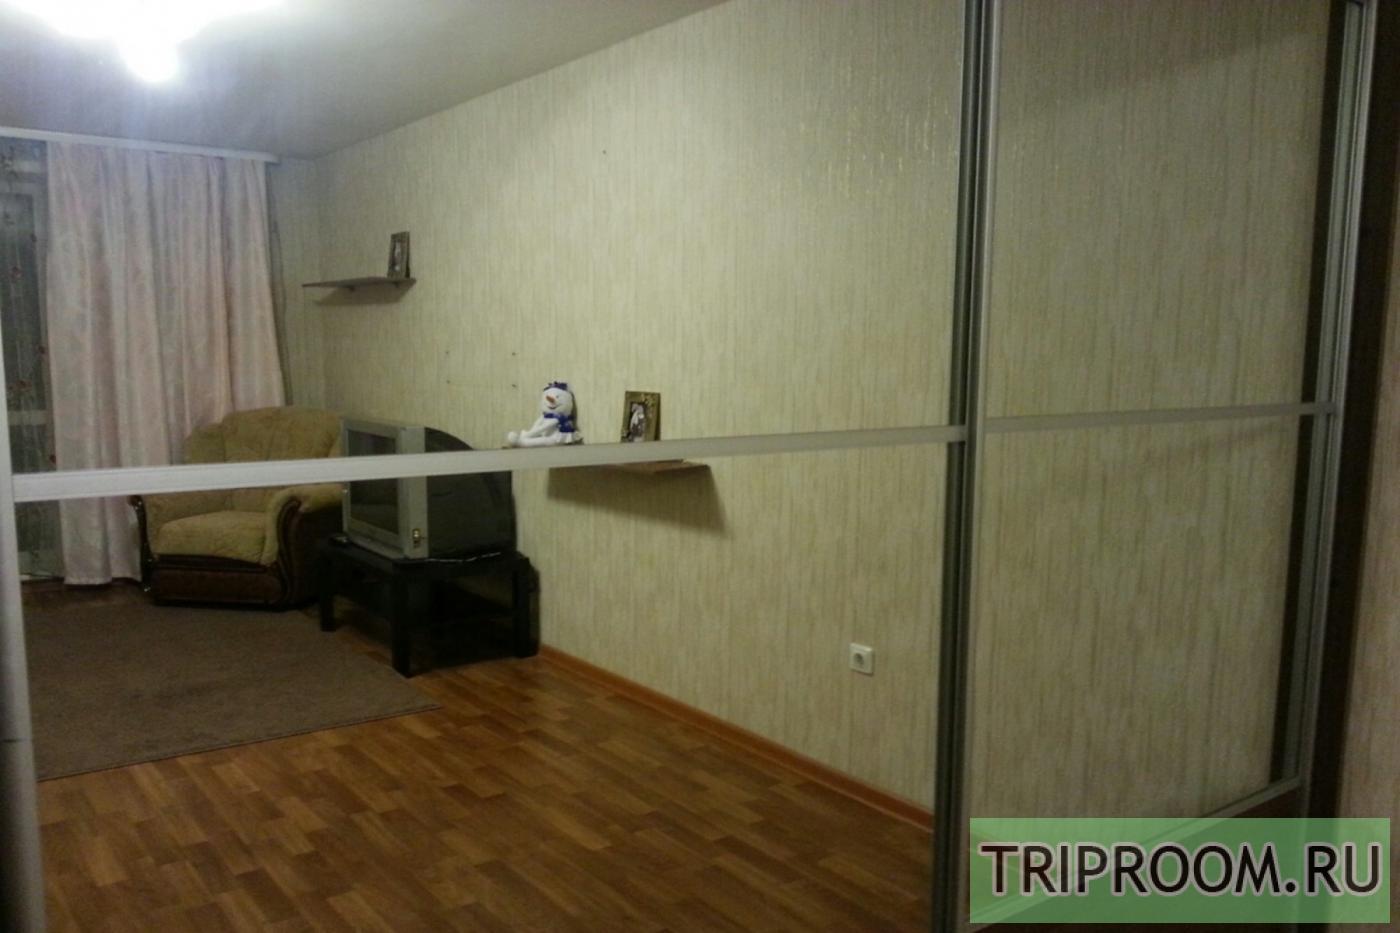 1-комнатная квартира посуточно (вариант № 30838), ул. Ермакова улица, фото № 14